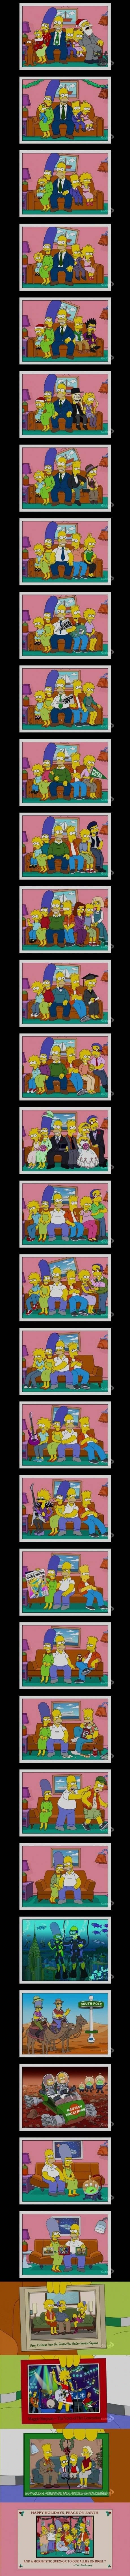 Simpsons Christmas Cards - Imgur